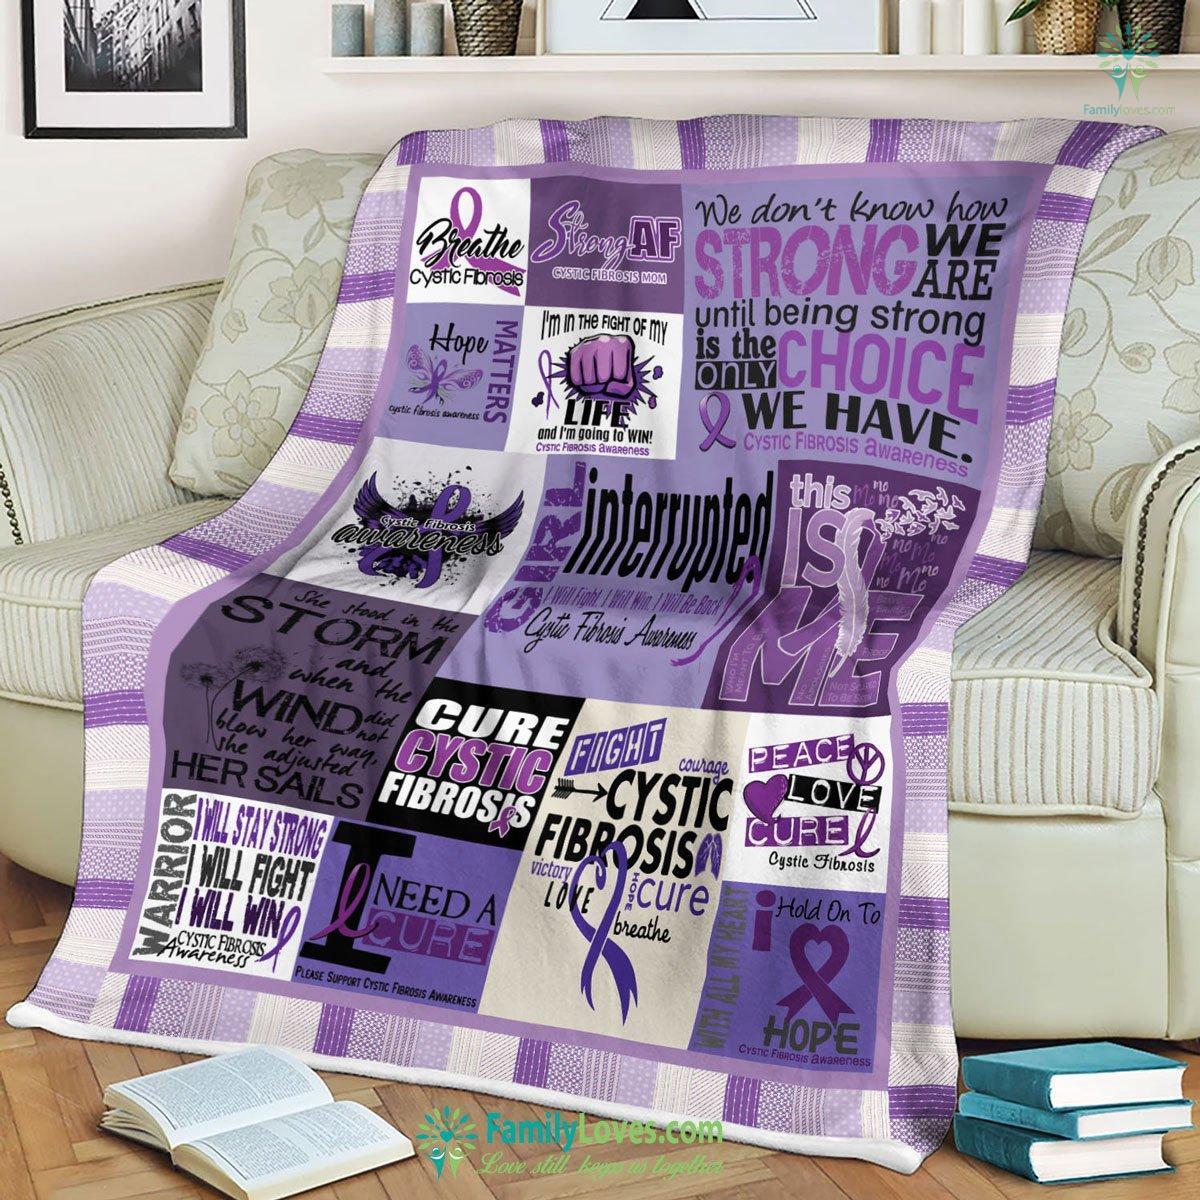 Cystic Fibrosis Awareness Blanket 12 Familyloves.com